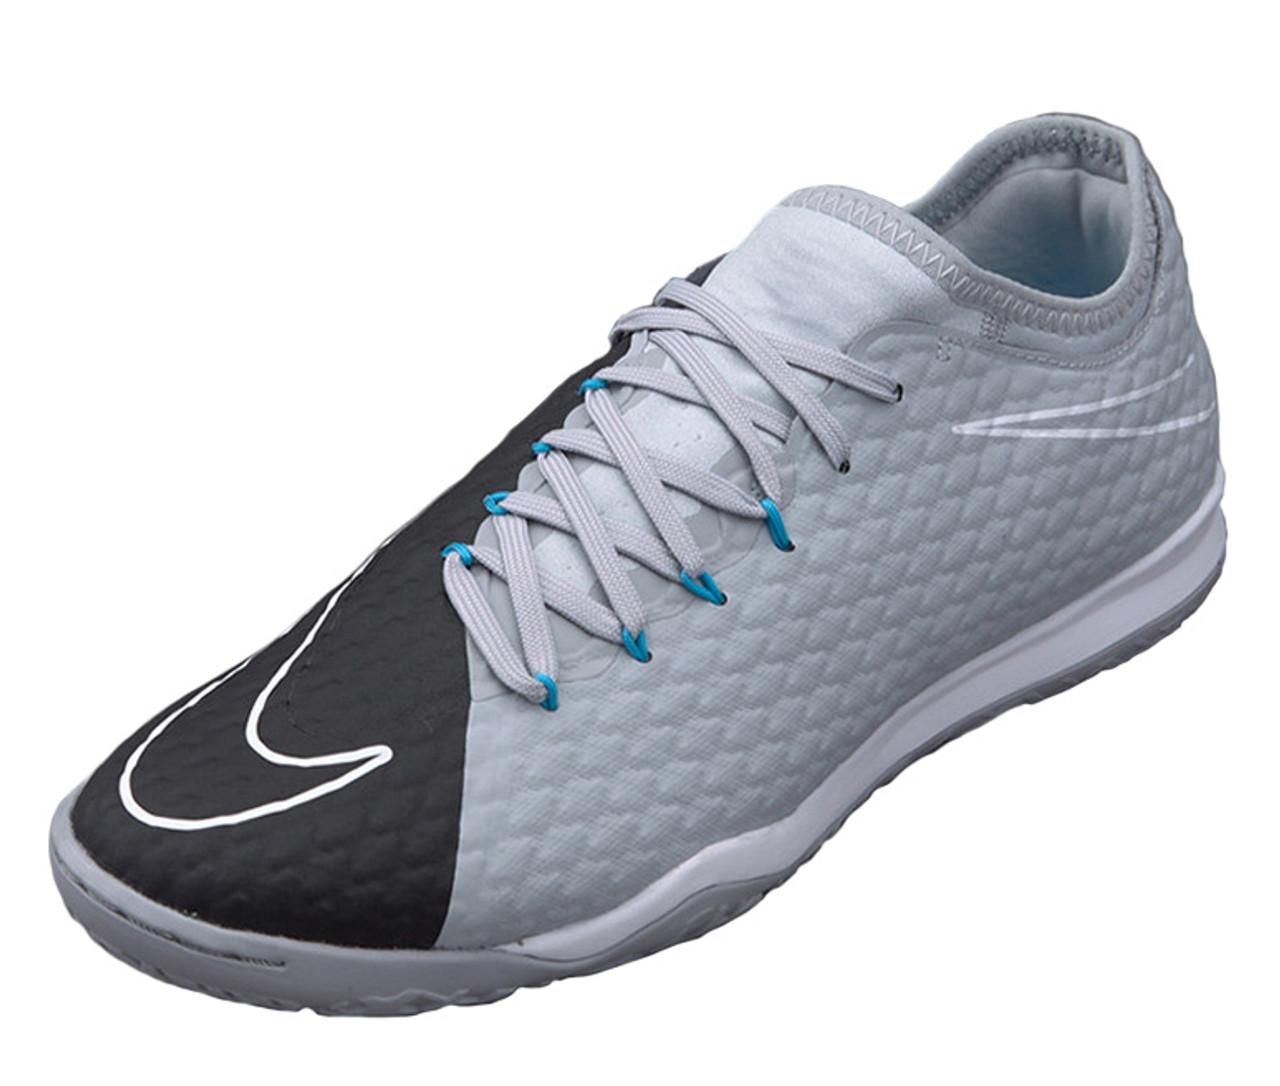 a3366a1d0 Nike HypervenomX Finale II IC RC - Wolf Grey Black Chlorine Blue RC  (032919) - ohp soccer